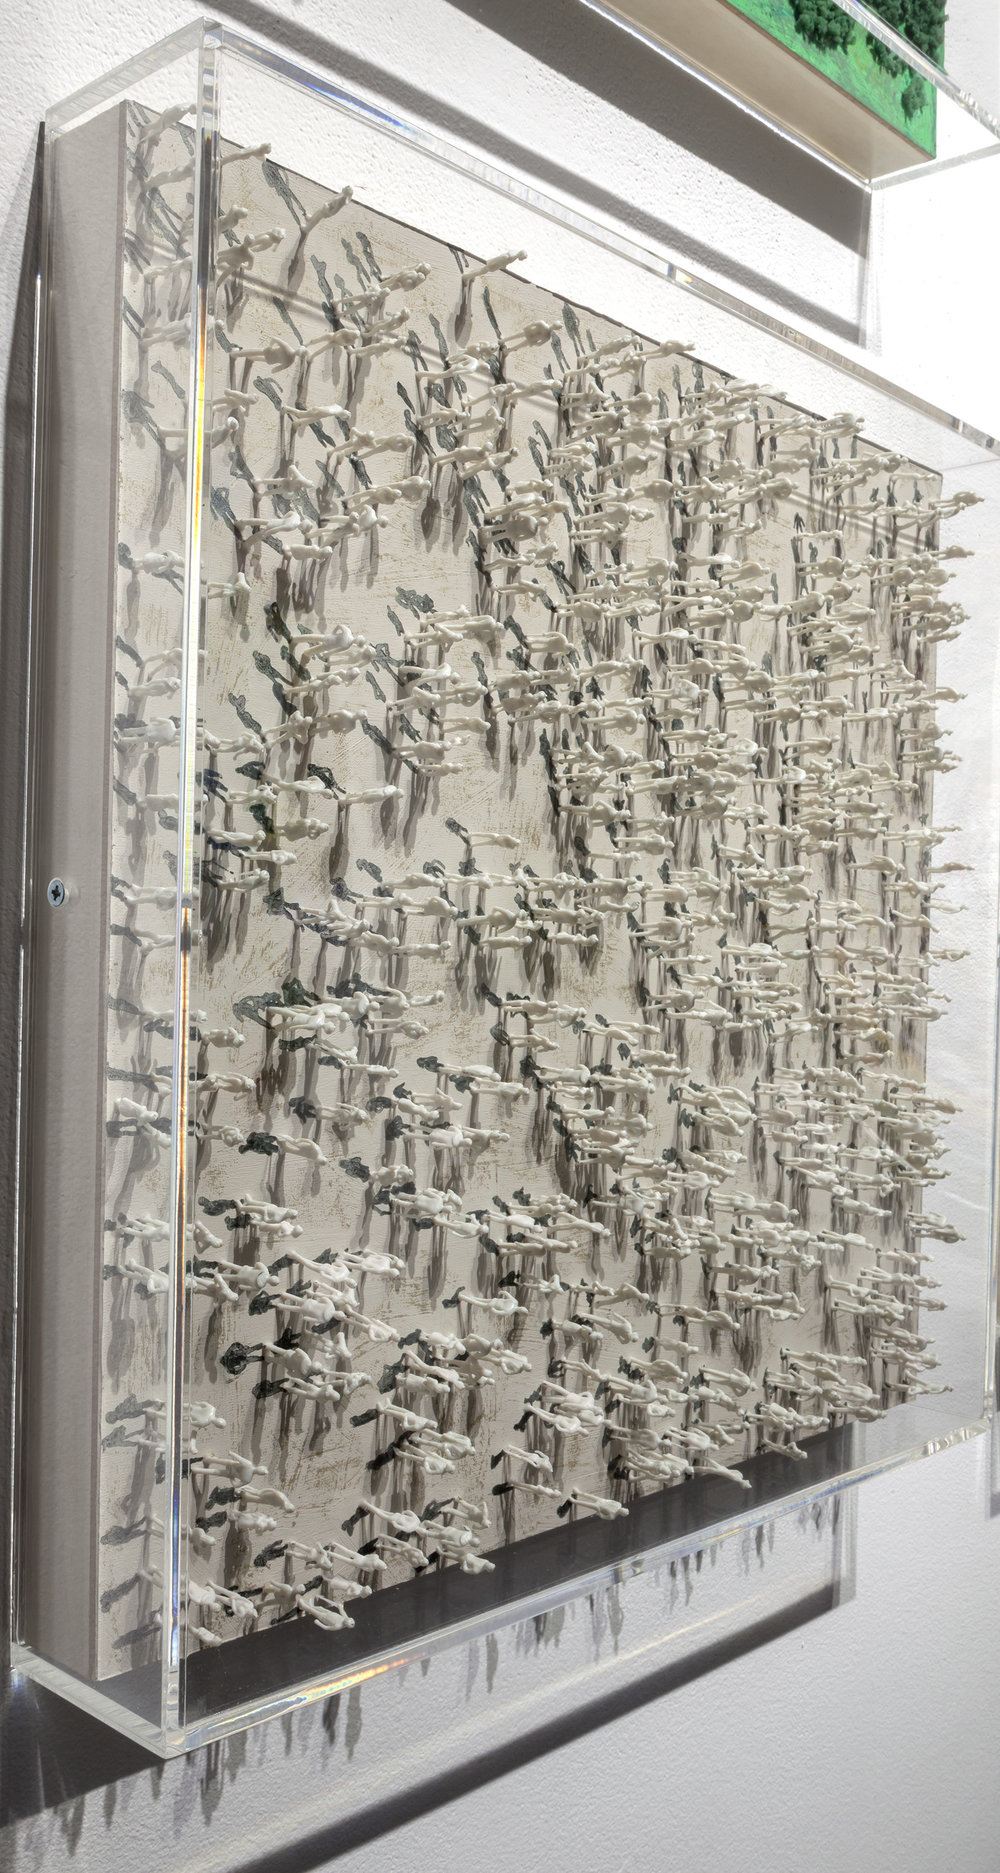 Organized Chaos II, mixed media 18.75 x 18.75 inches, 2016